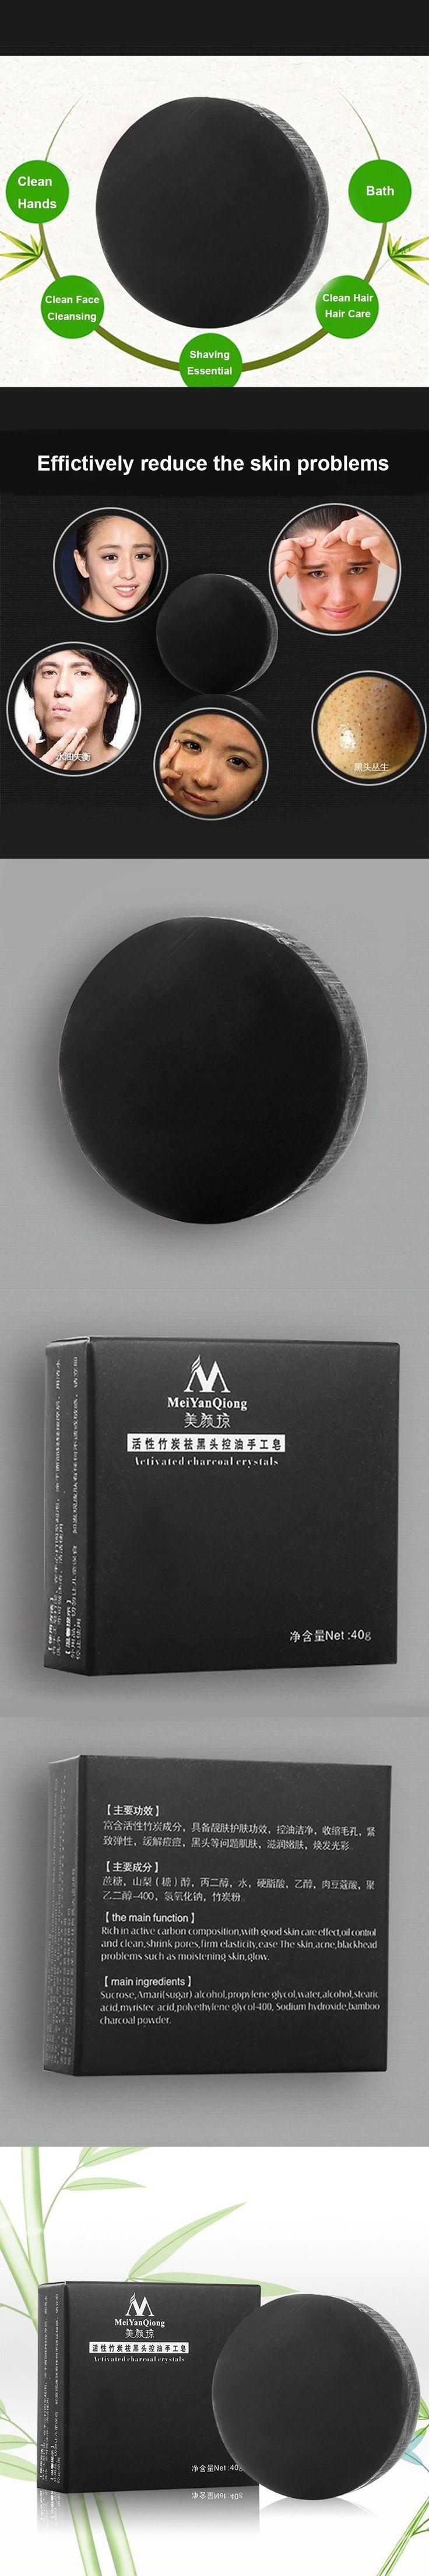 Bamboo Charcoal Handmade Soap Treatment Skin Care Natural Skin Whitening Soap Blackhead Remover Acne Treatment Oil Control 2 Pcs